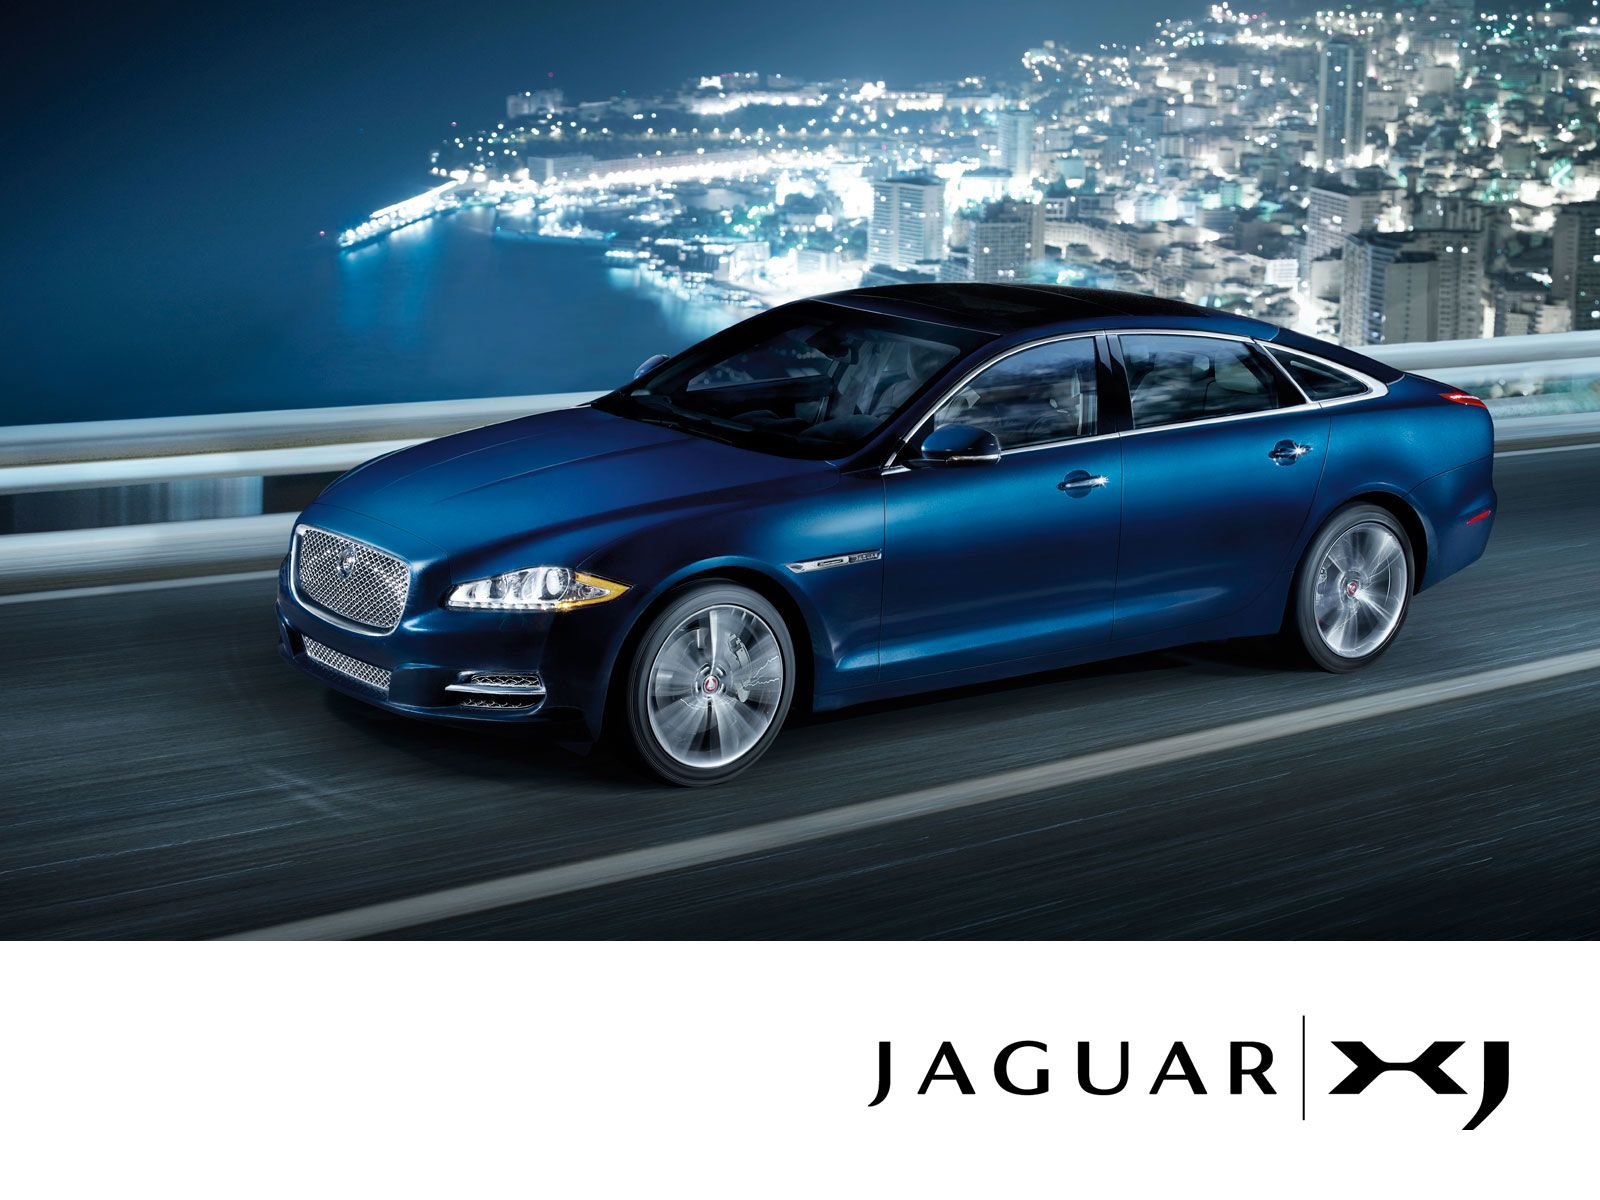 Jaguar XJ blue